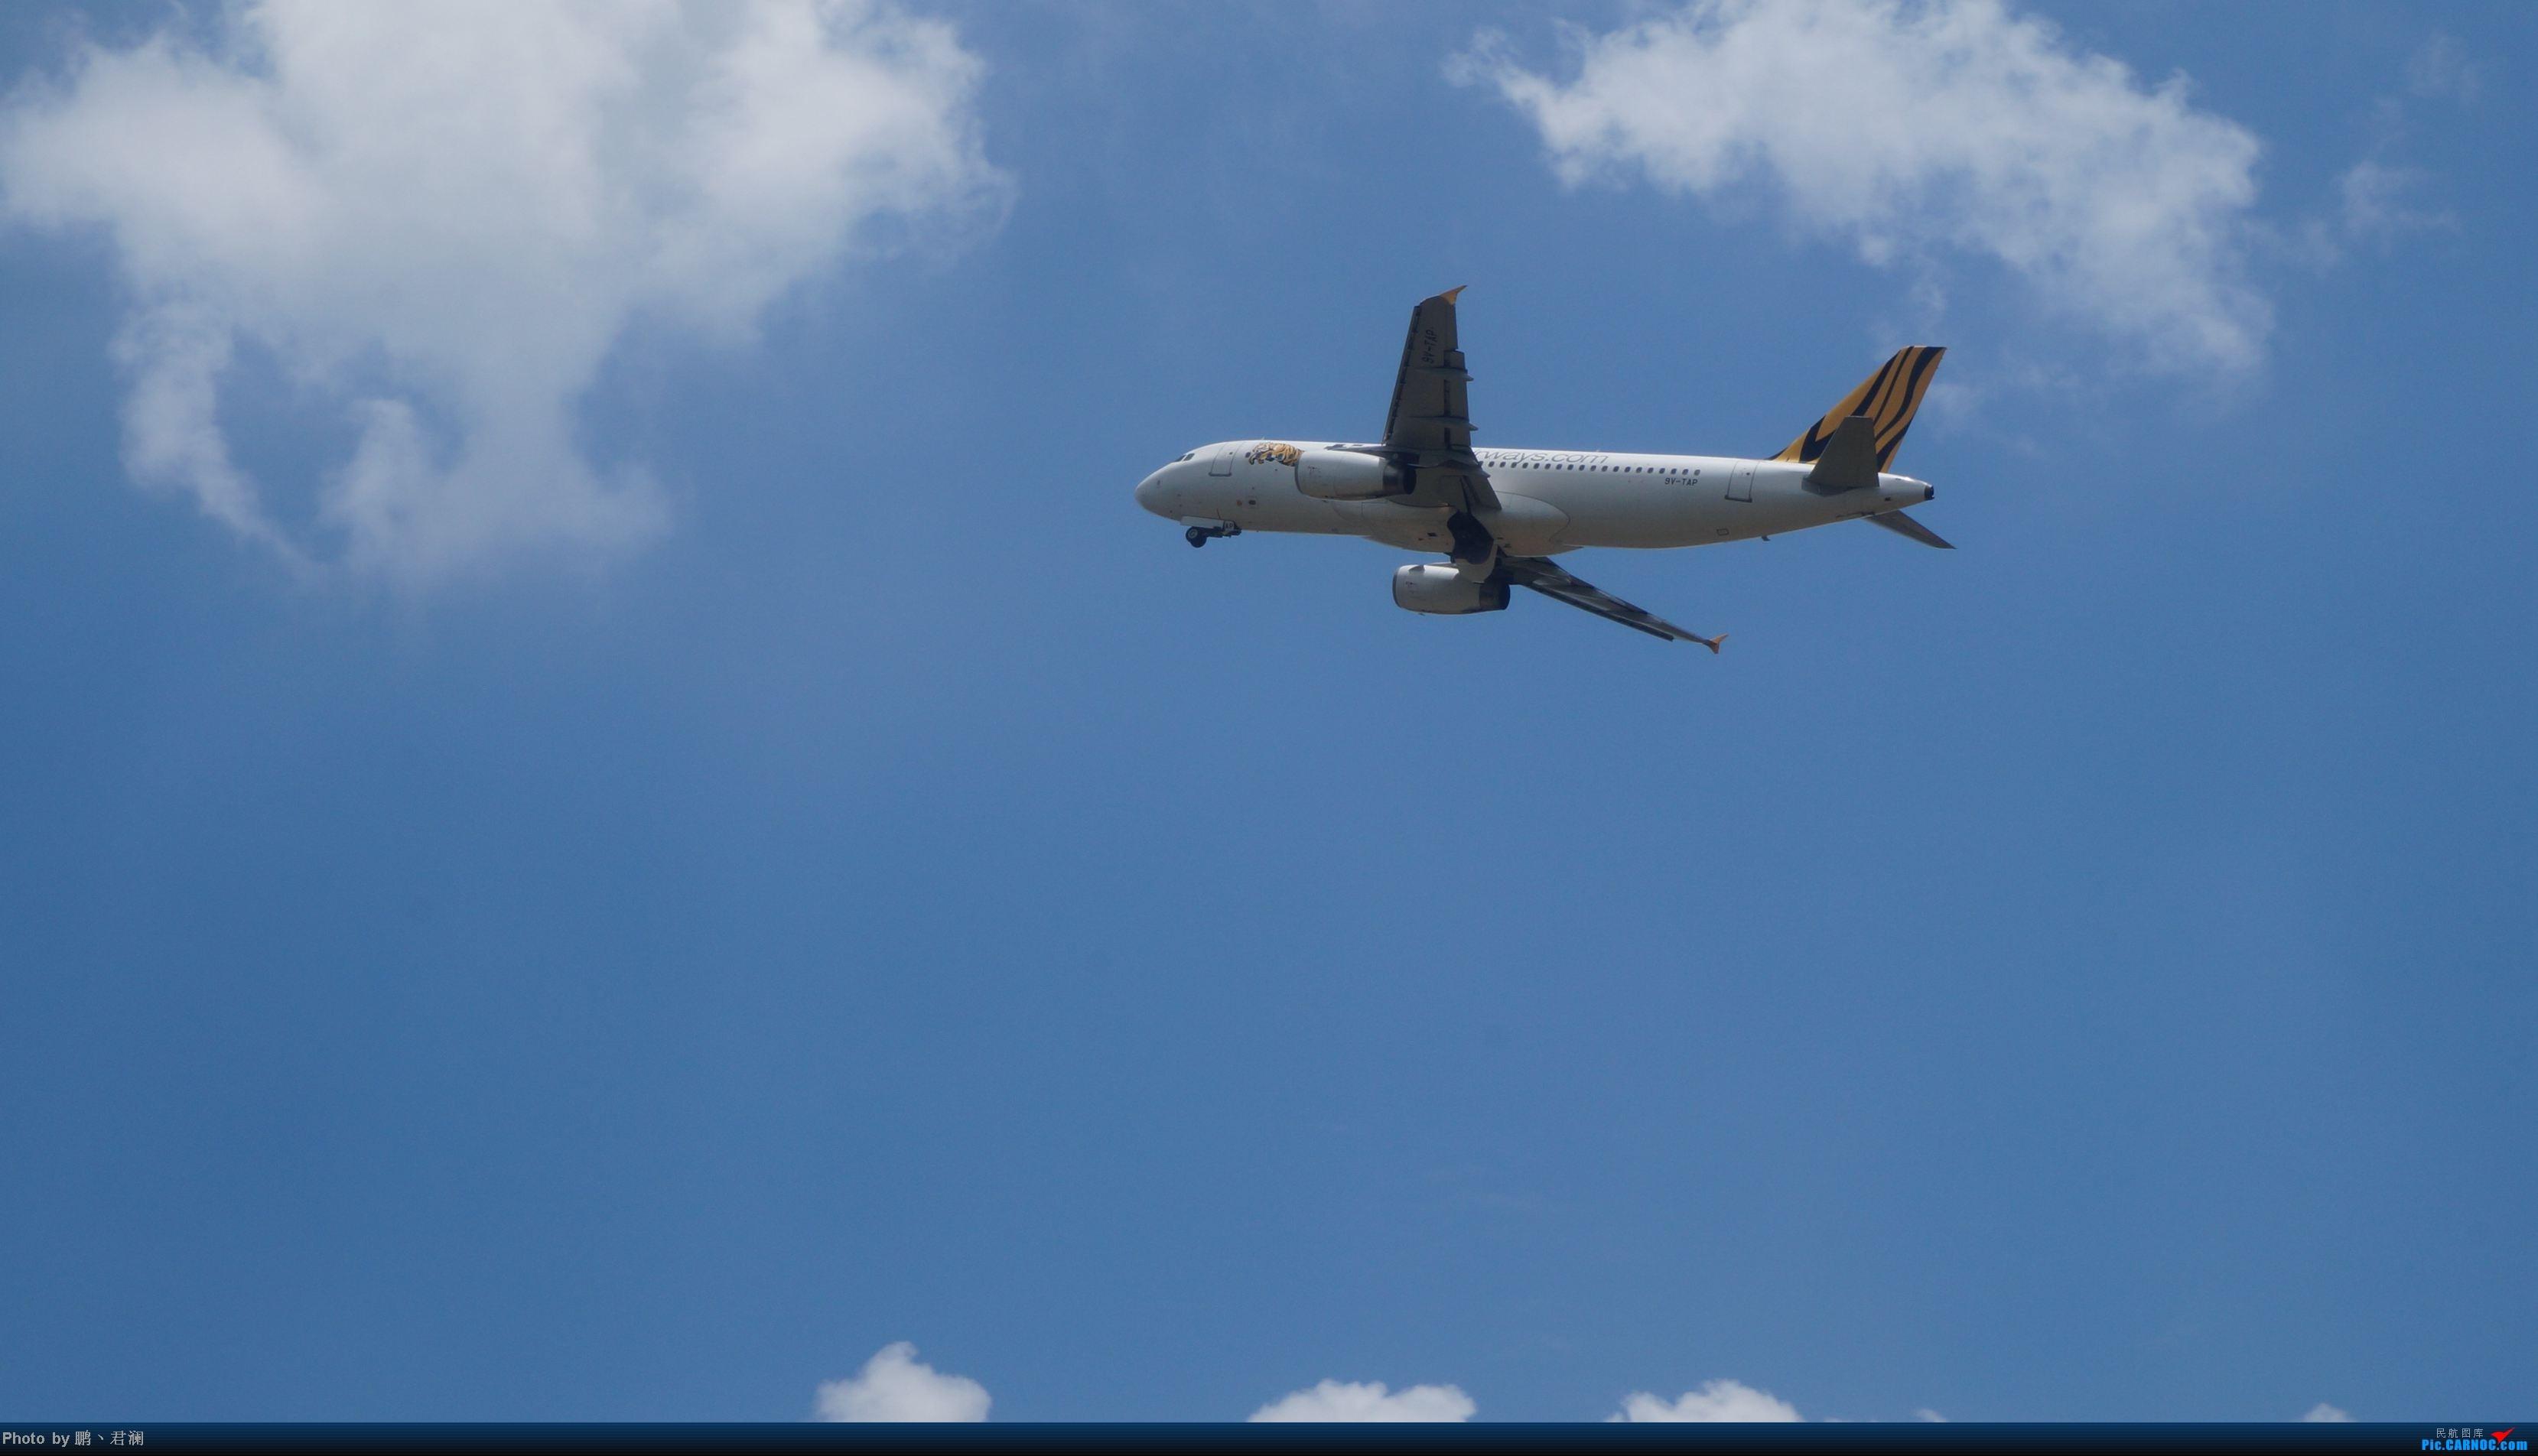 Re:[原创]【海南飞友会】海口炎炎烈日拍机进行时 蓝天+CB+....小微单 AIRBUS A320-200 9V-TAP 中国海口美兰机场